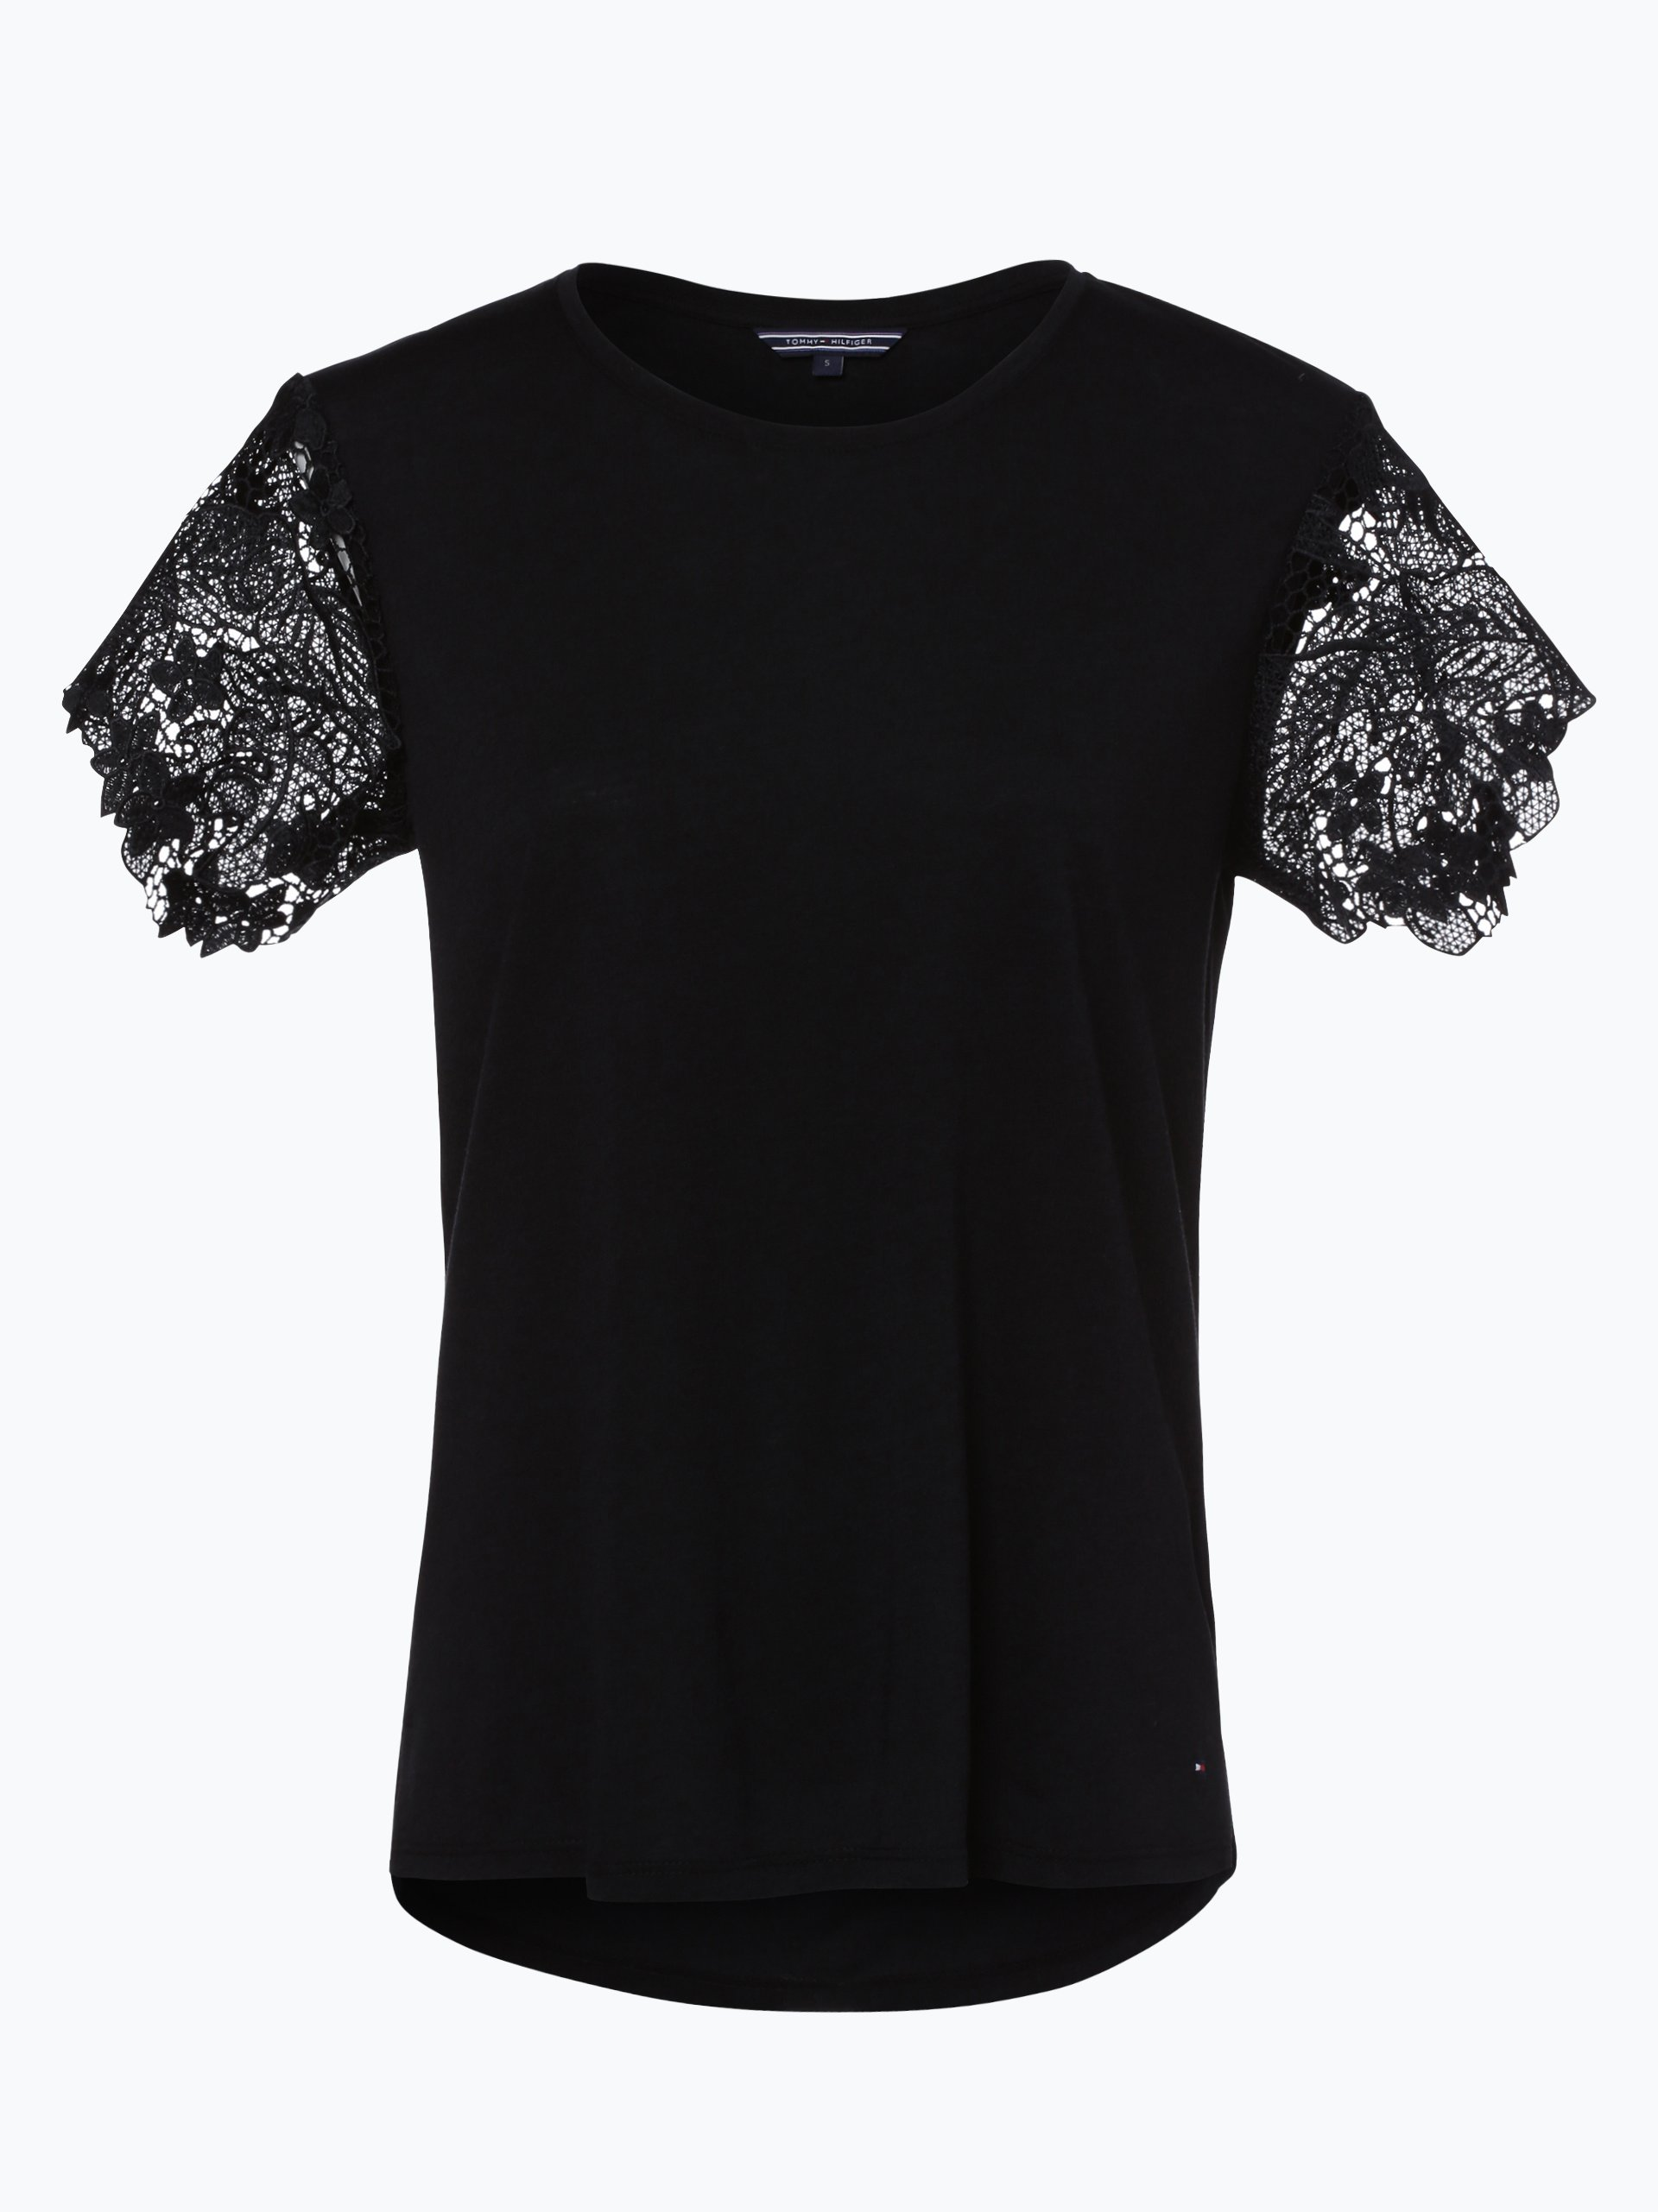 tommy hilfiger damen t shirt dilma online kaufen peek. Black Bedroom Furniture Sets. Home Design Ideas